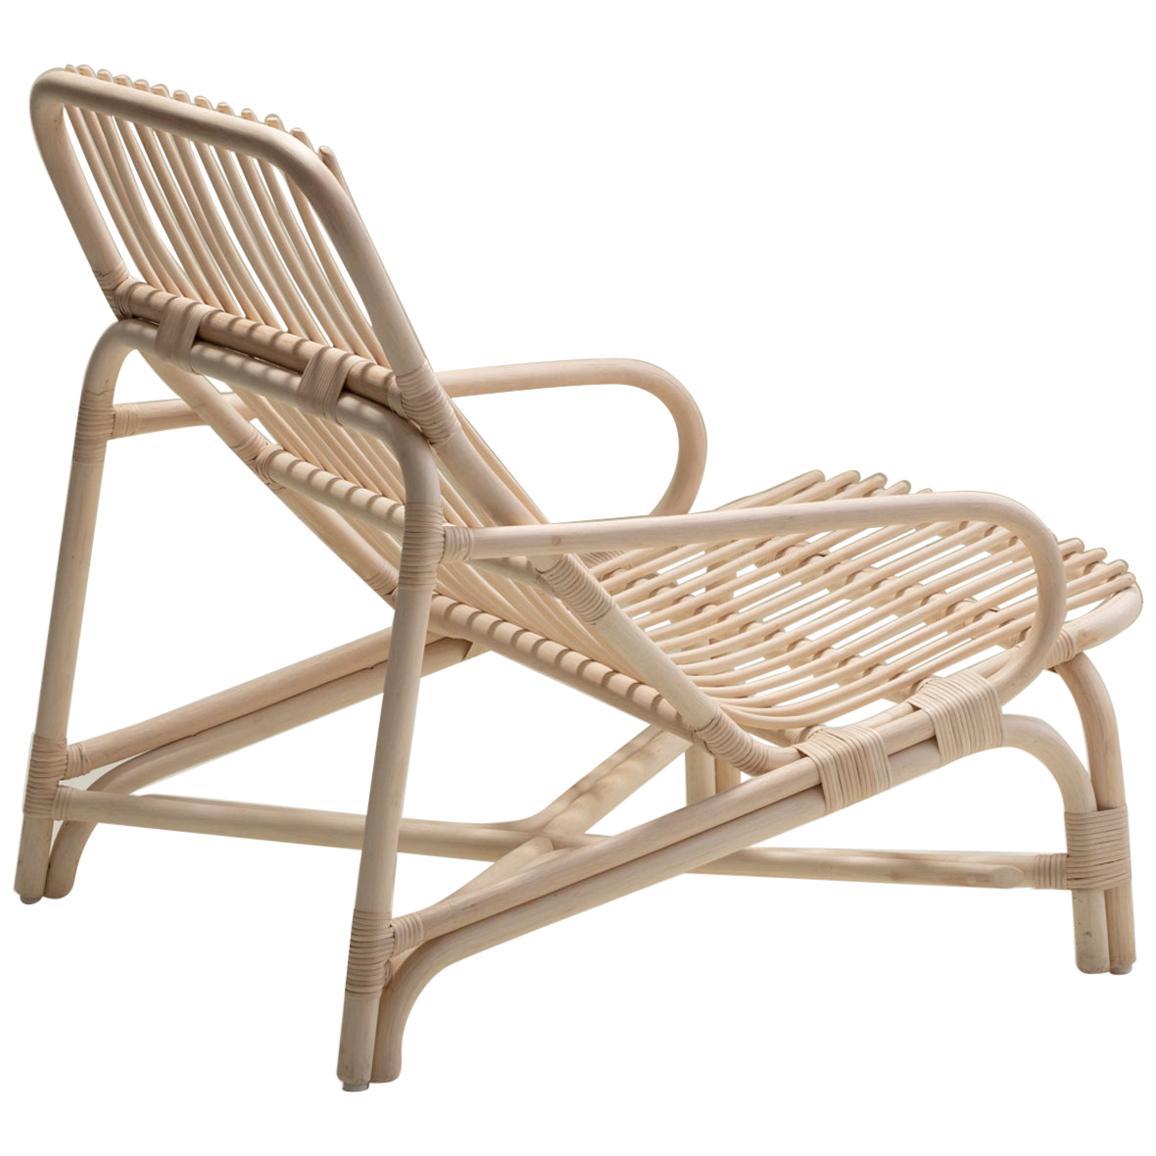 Handmade Natural Rattan Camelia Lounge Chair